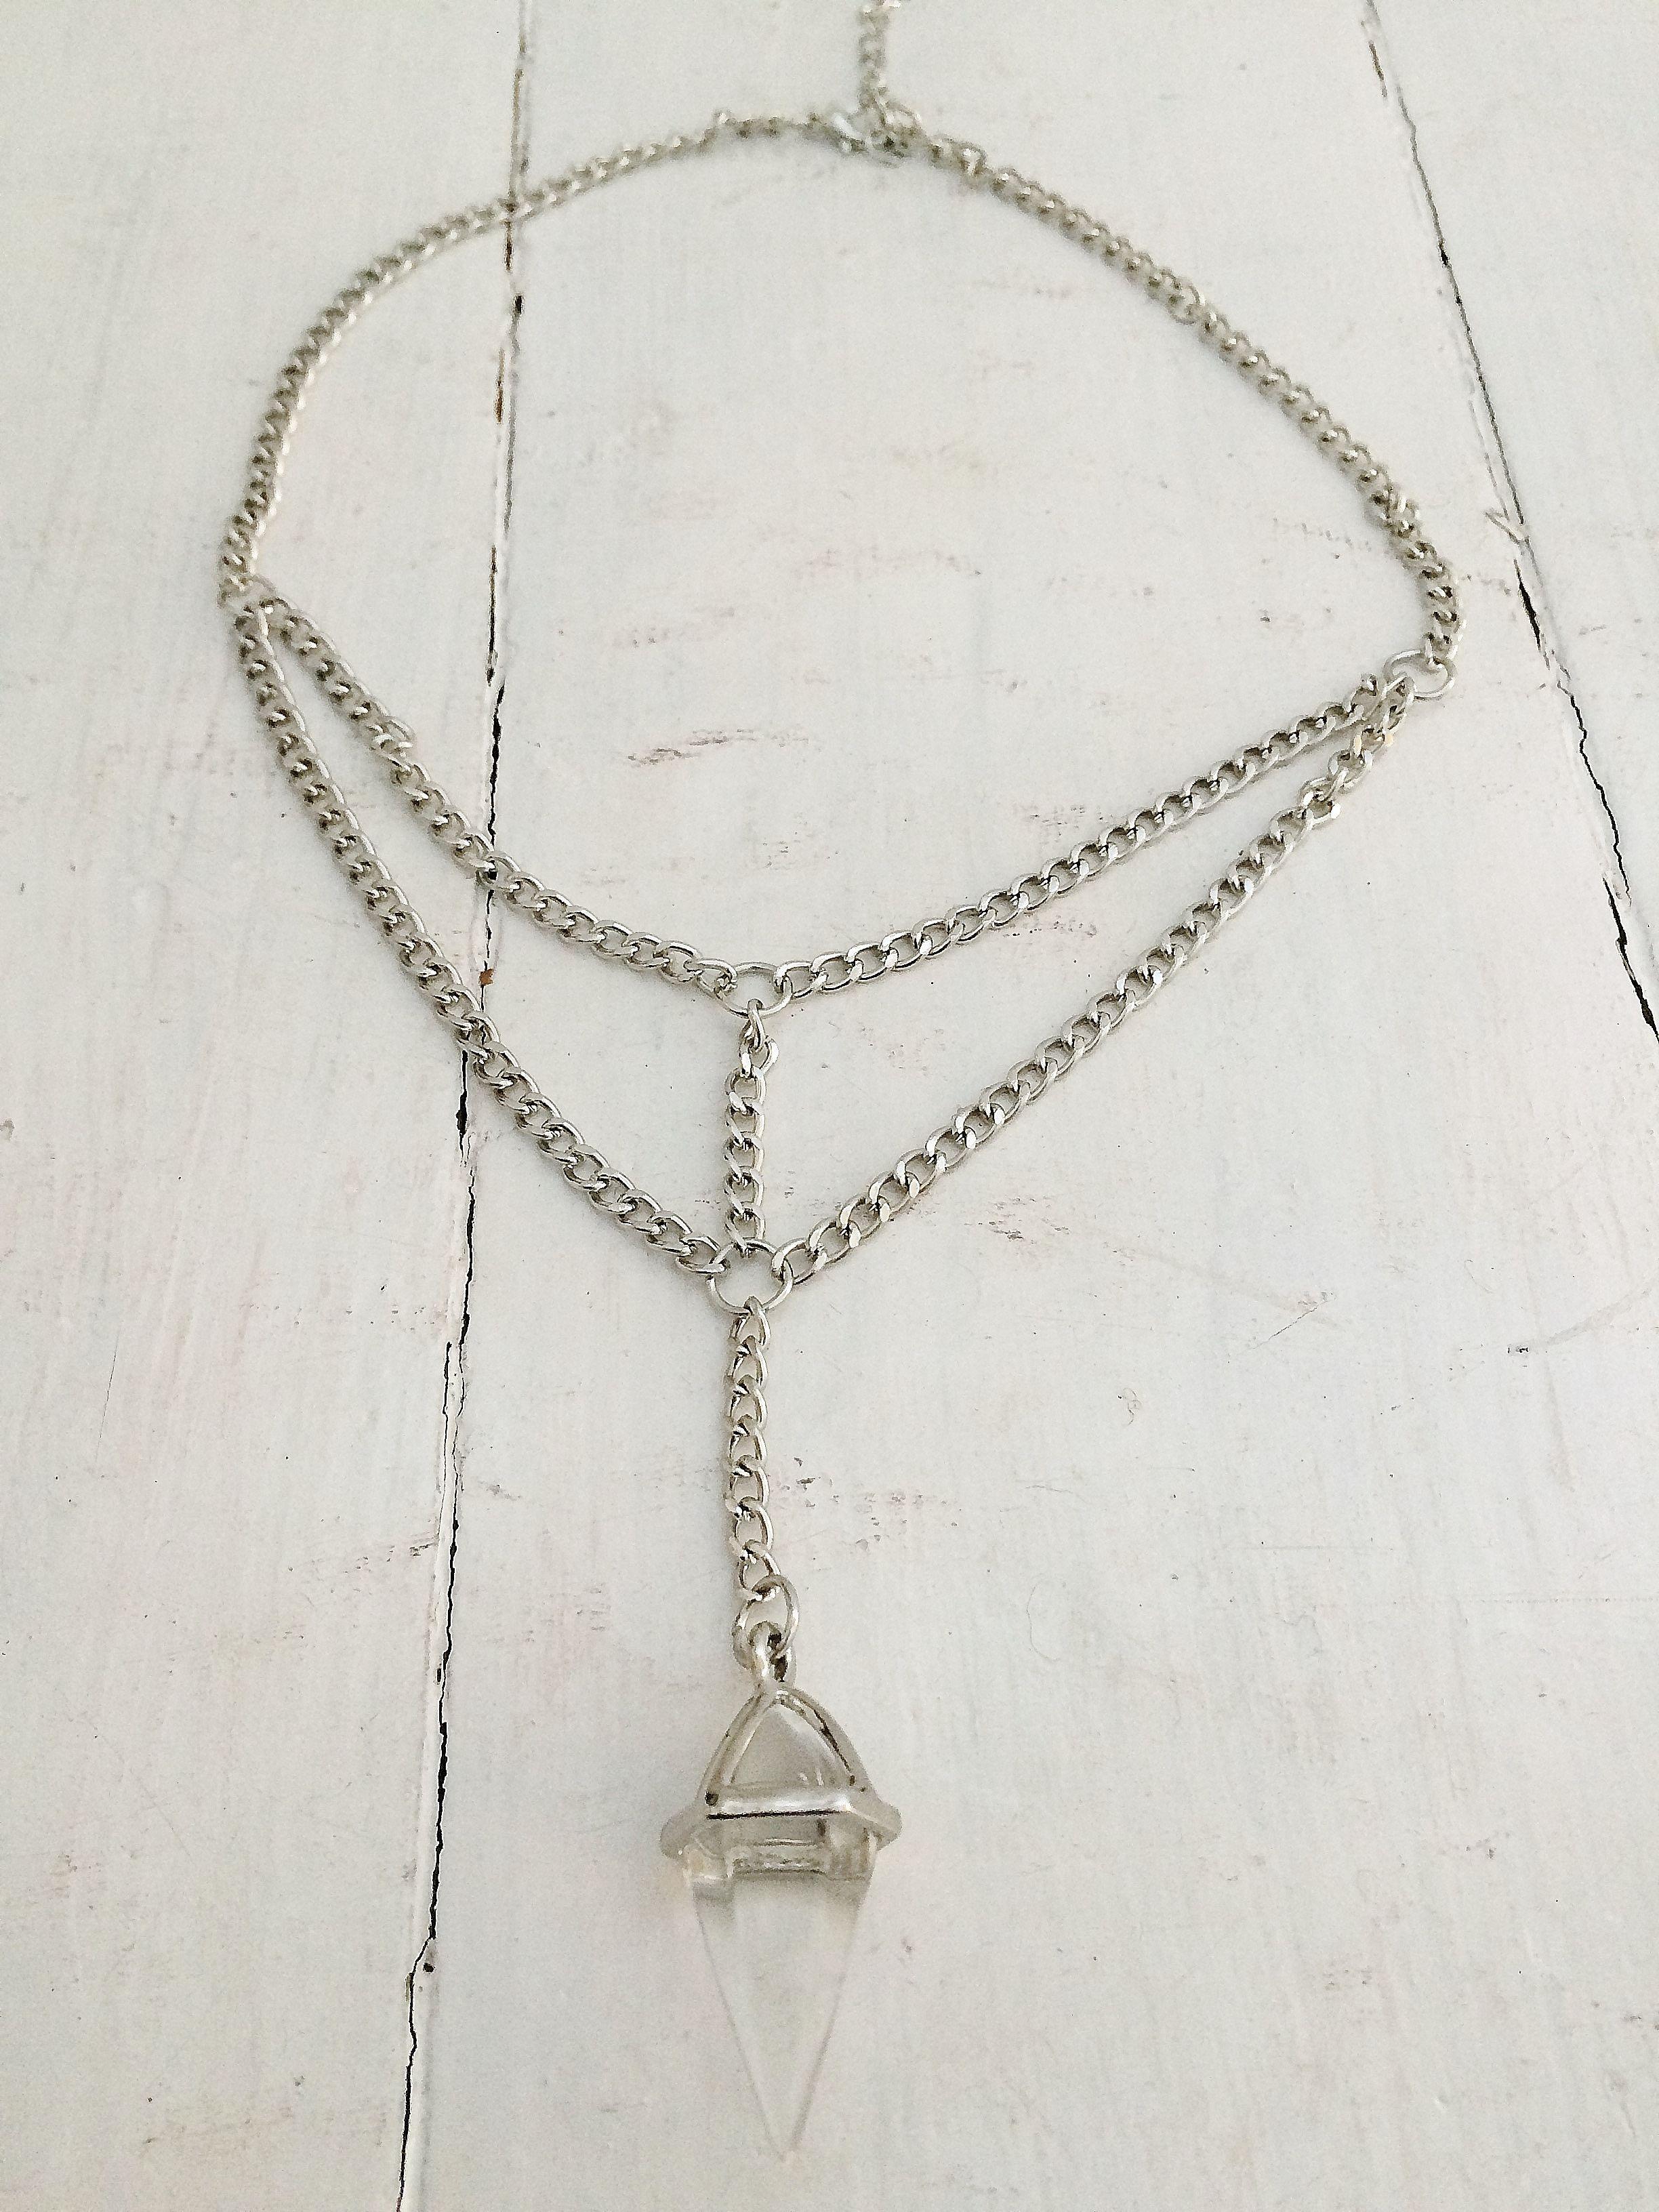 Lantern prism drop chain necklace - Silver